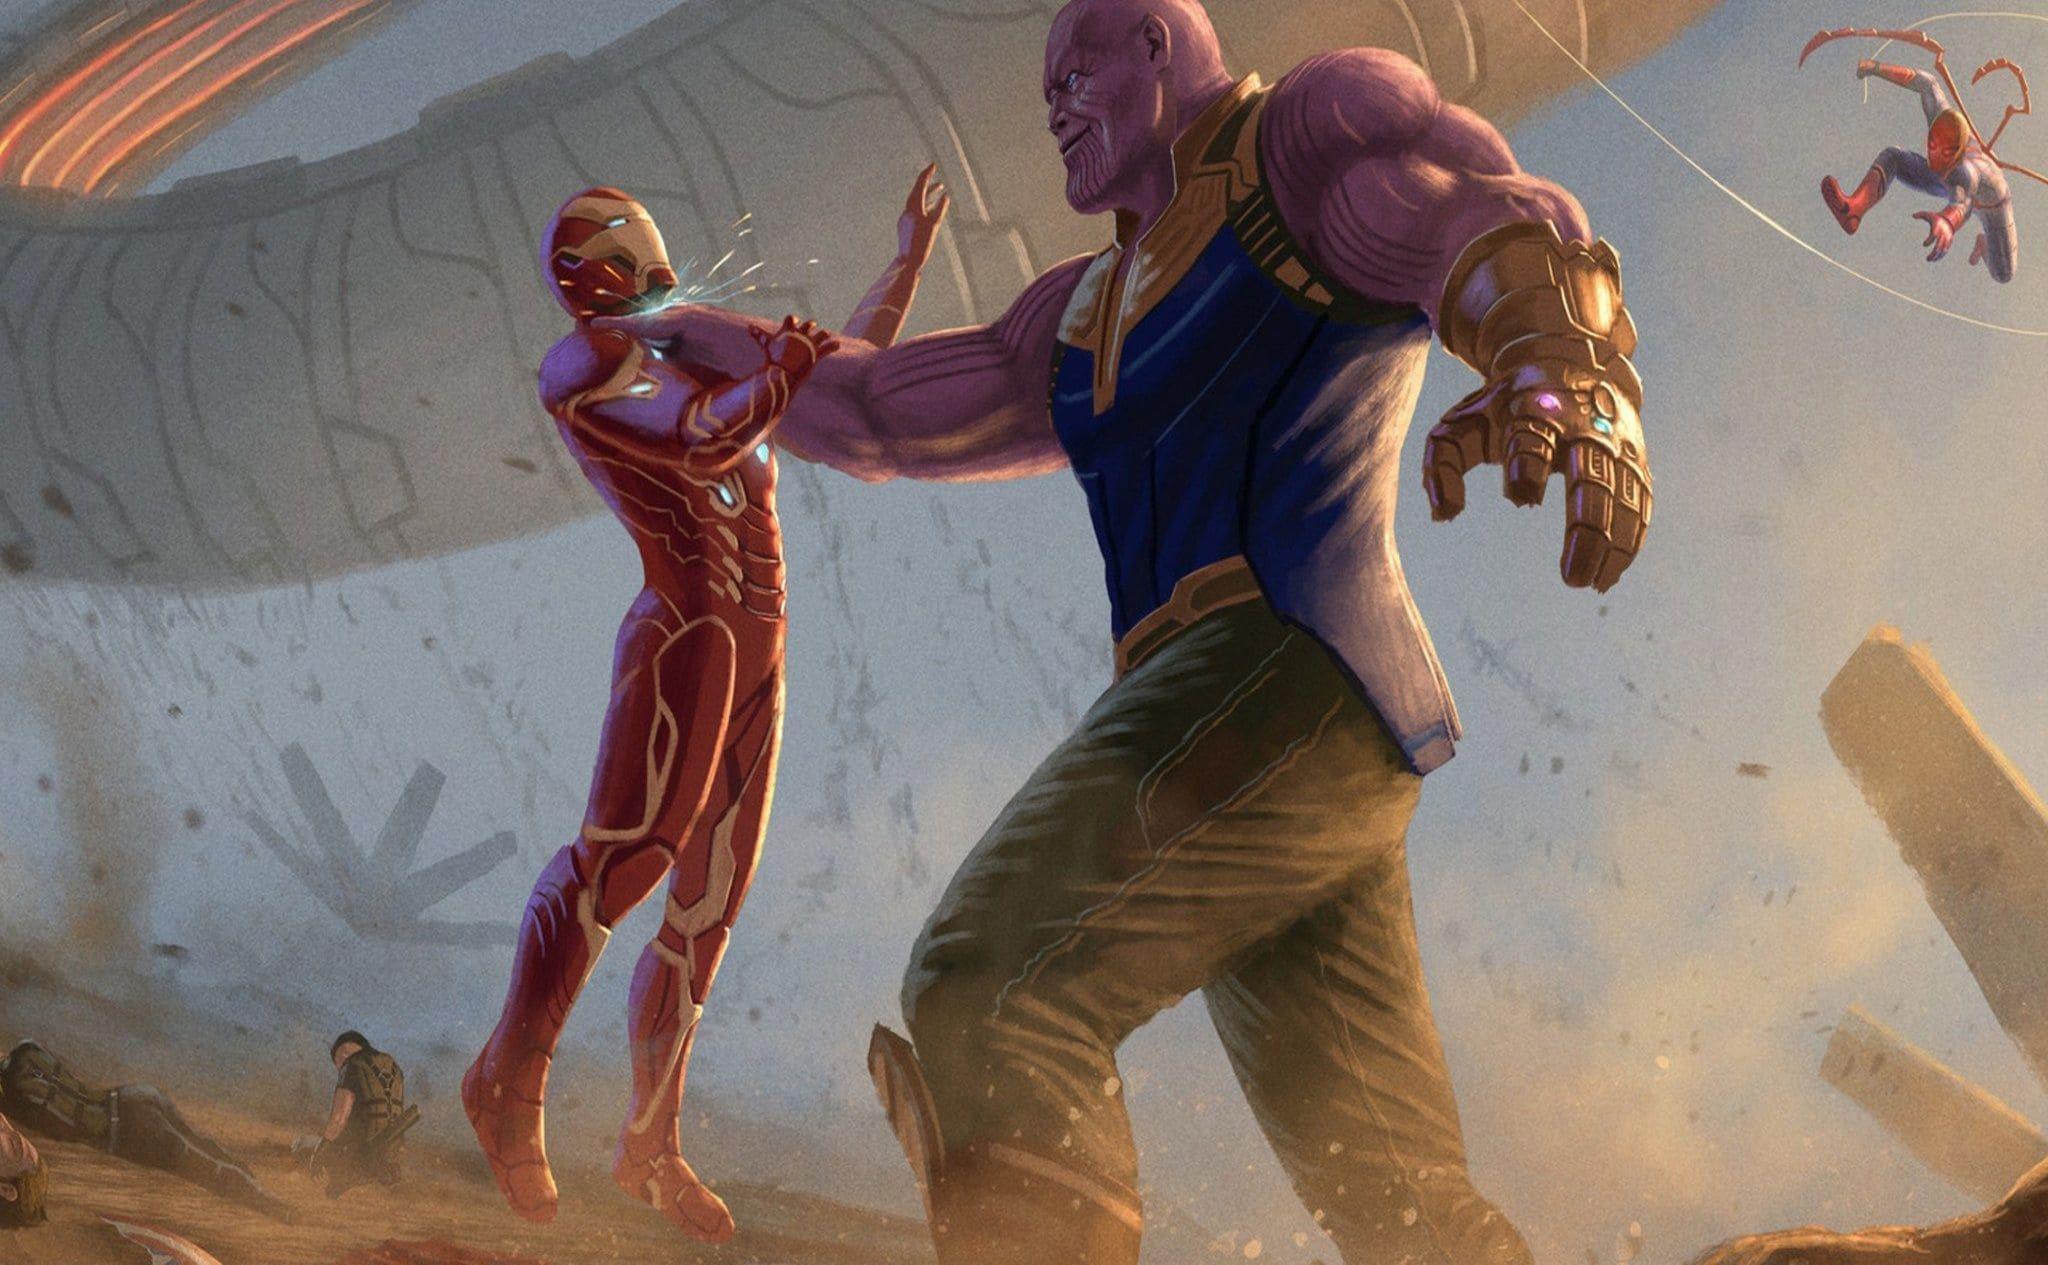 thanos-iron-man-avengers-infinity-war-2018-artwork-uv-2048x1152